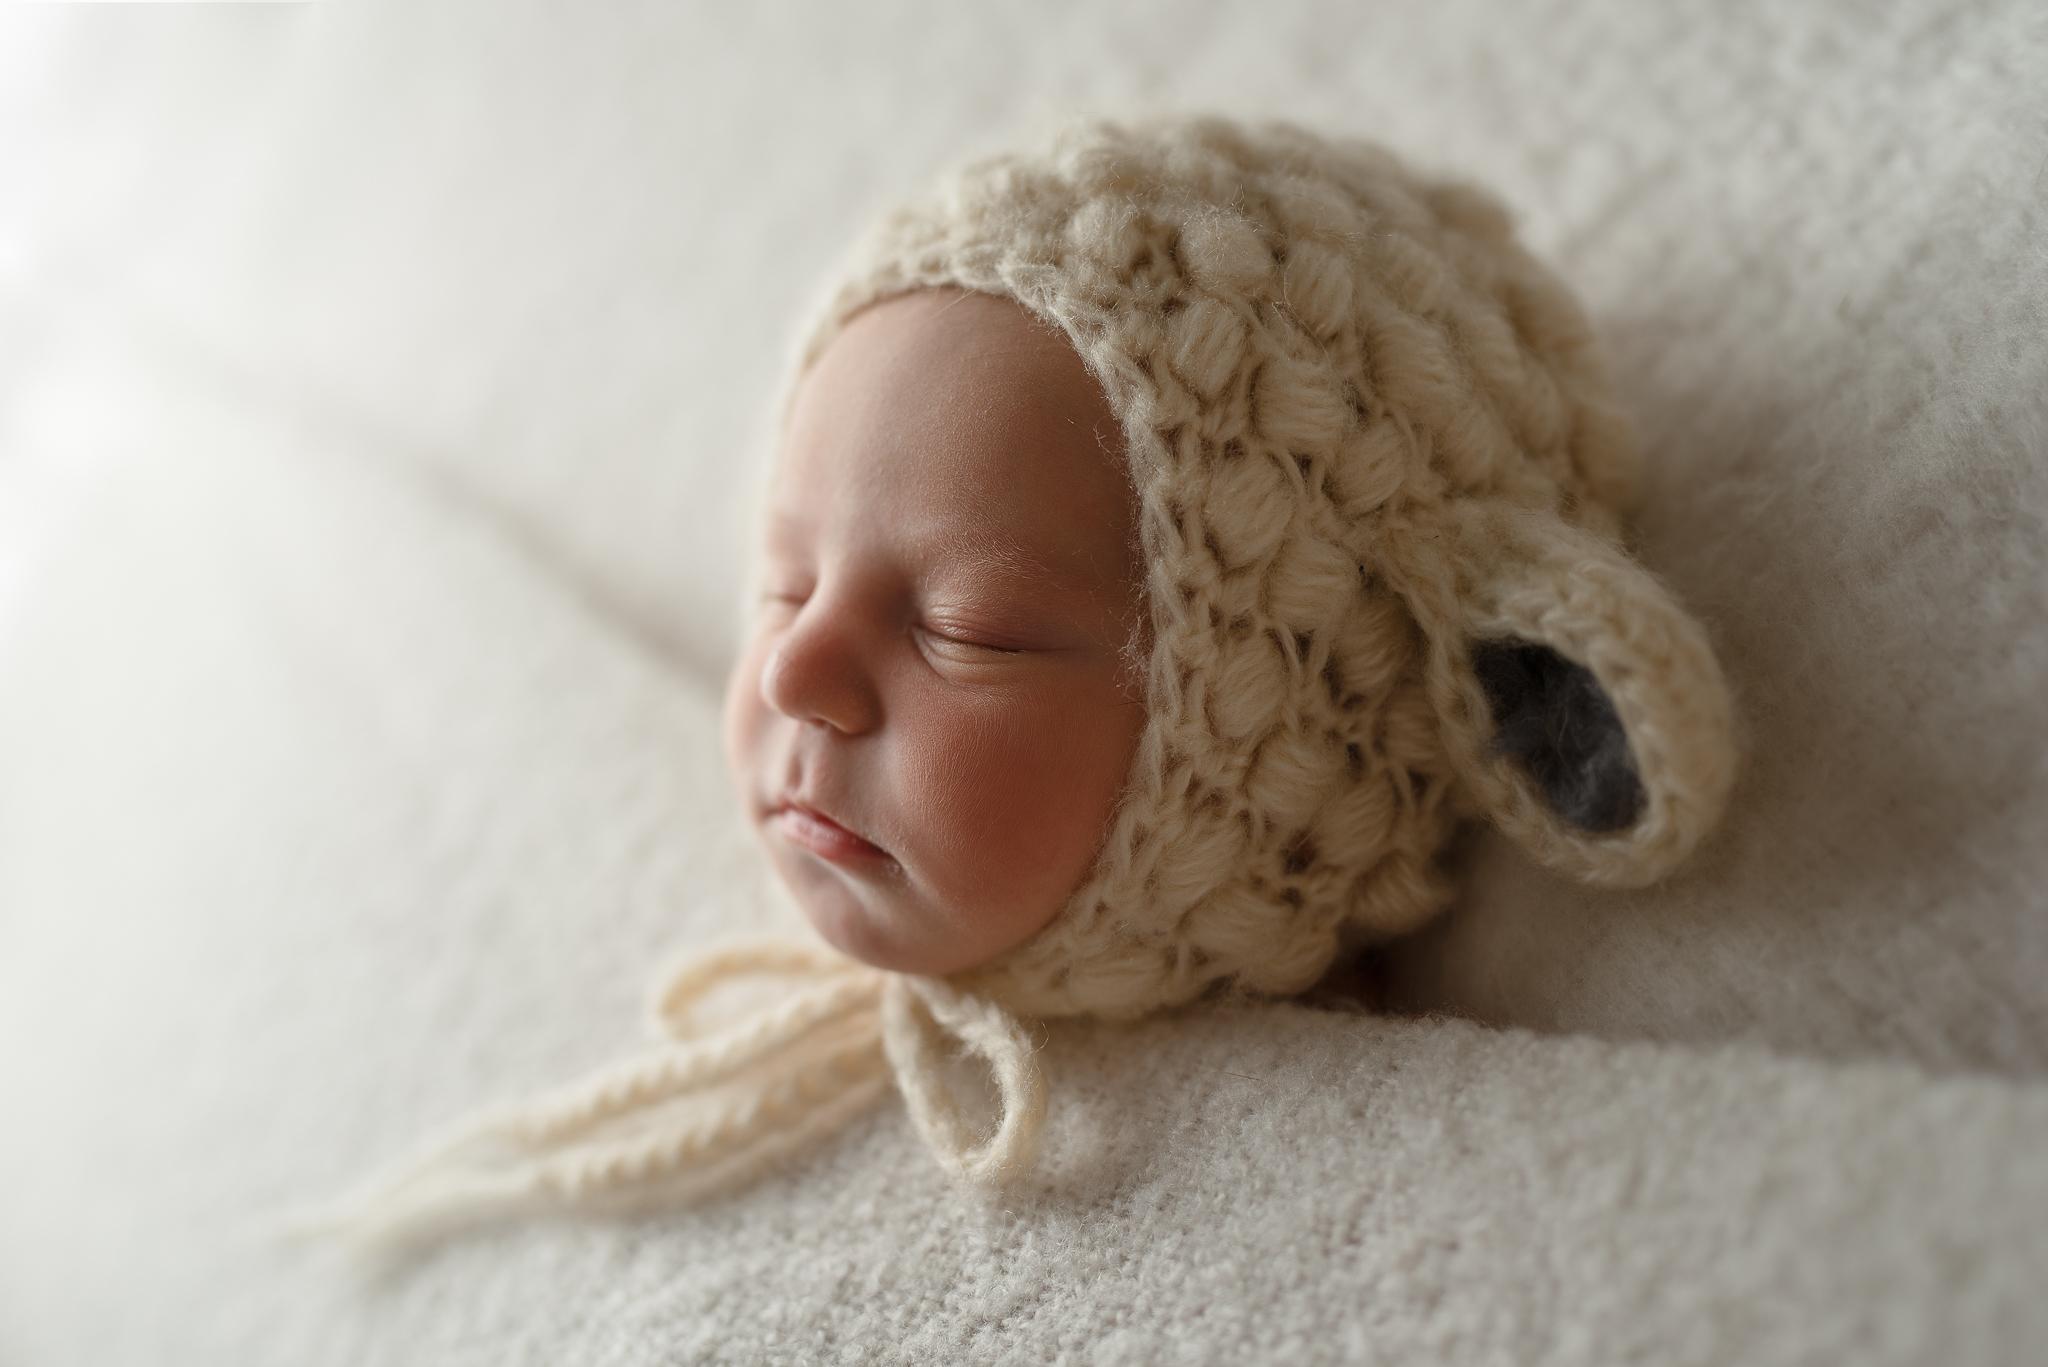 Newborn147NaomiLuciennePhotography032019-Edit.jpg